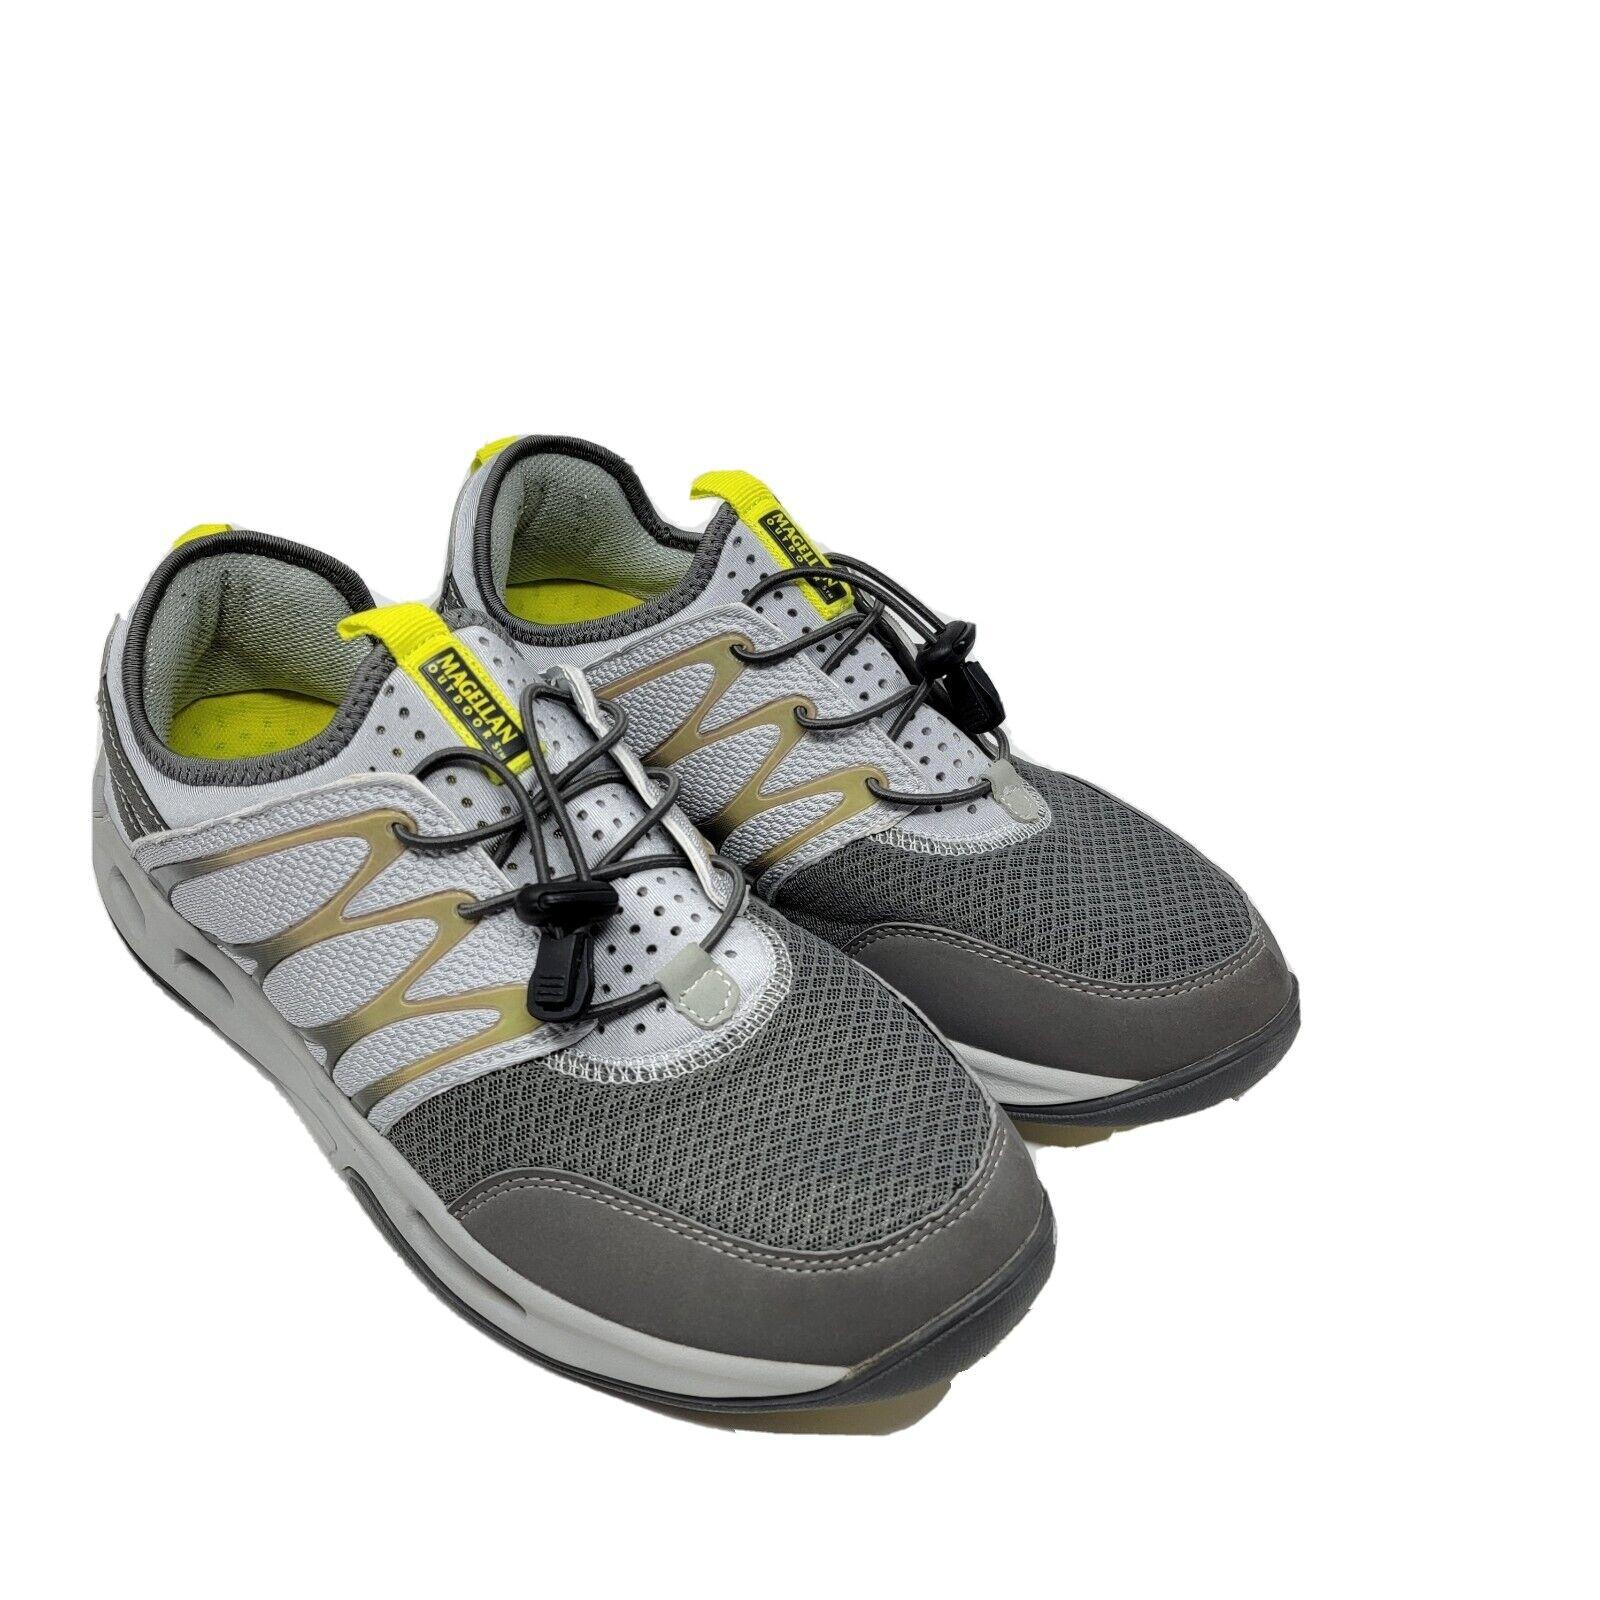 Magellan Outdoors Trail Sneakers Size 11 Gray Slip-On FWMFMC2079